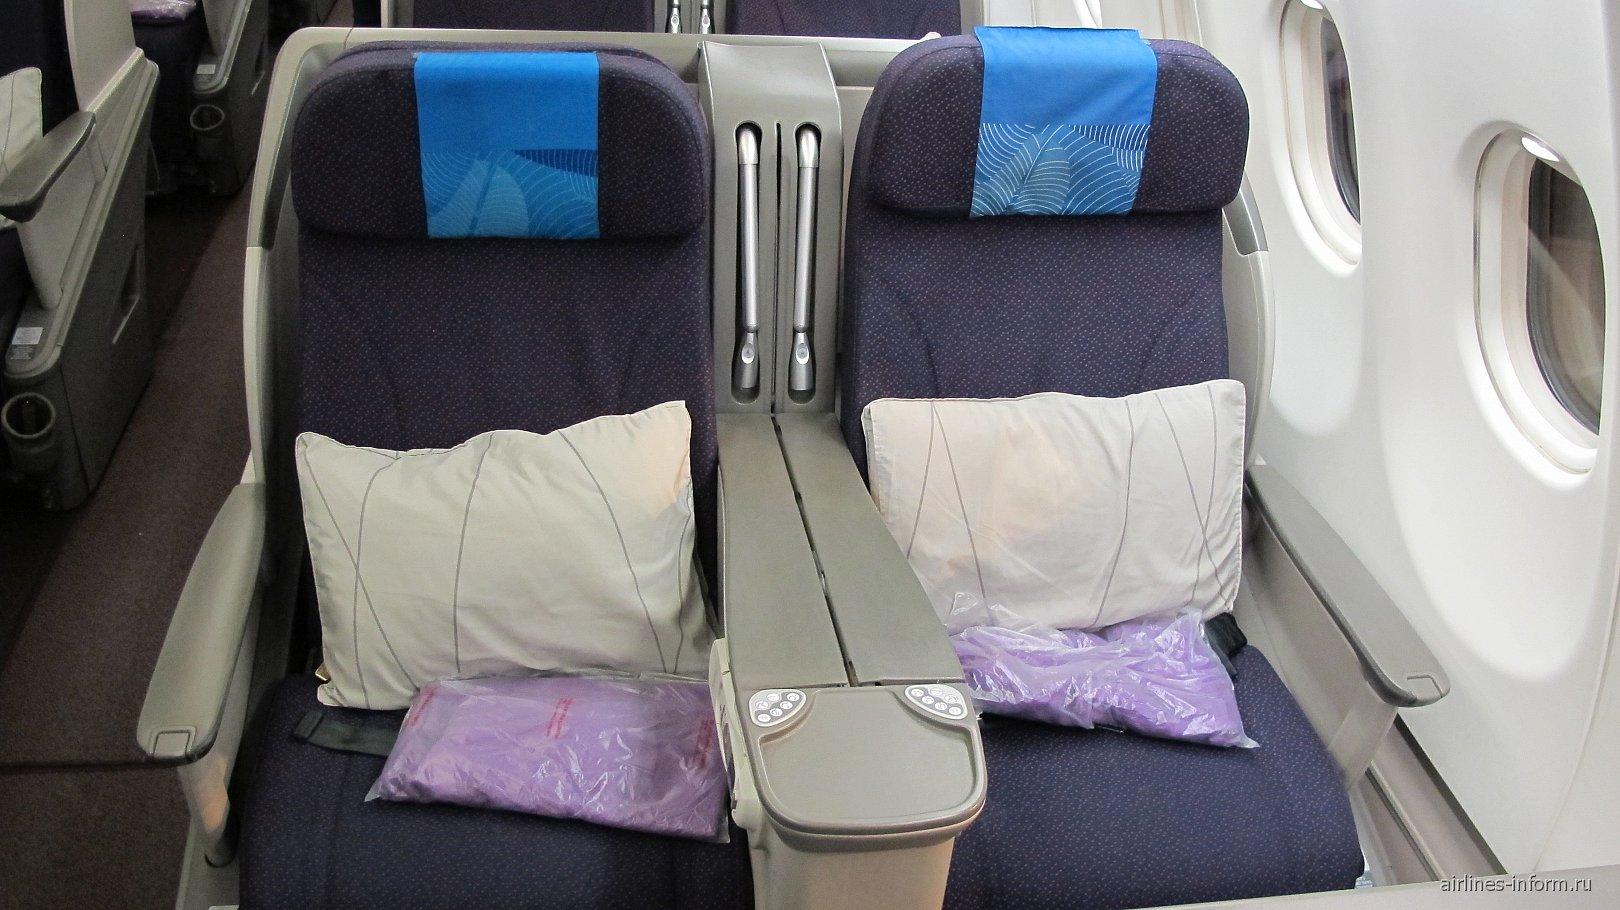 Кресла-коконы бизнес-класс в самолете Airbus A330-300 Малайзийских авиалиний